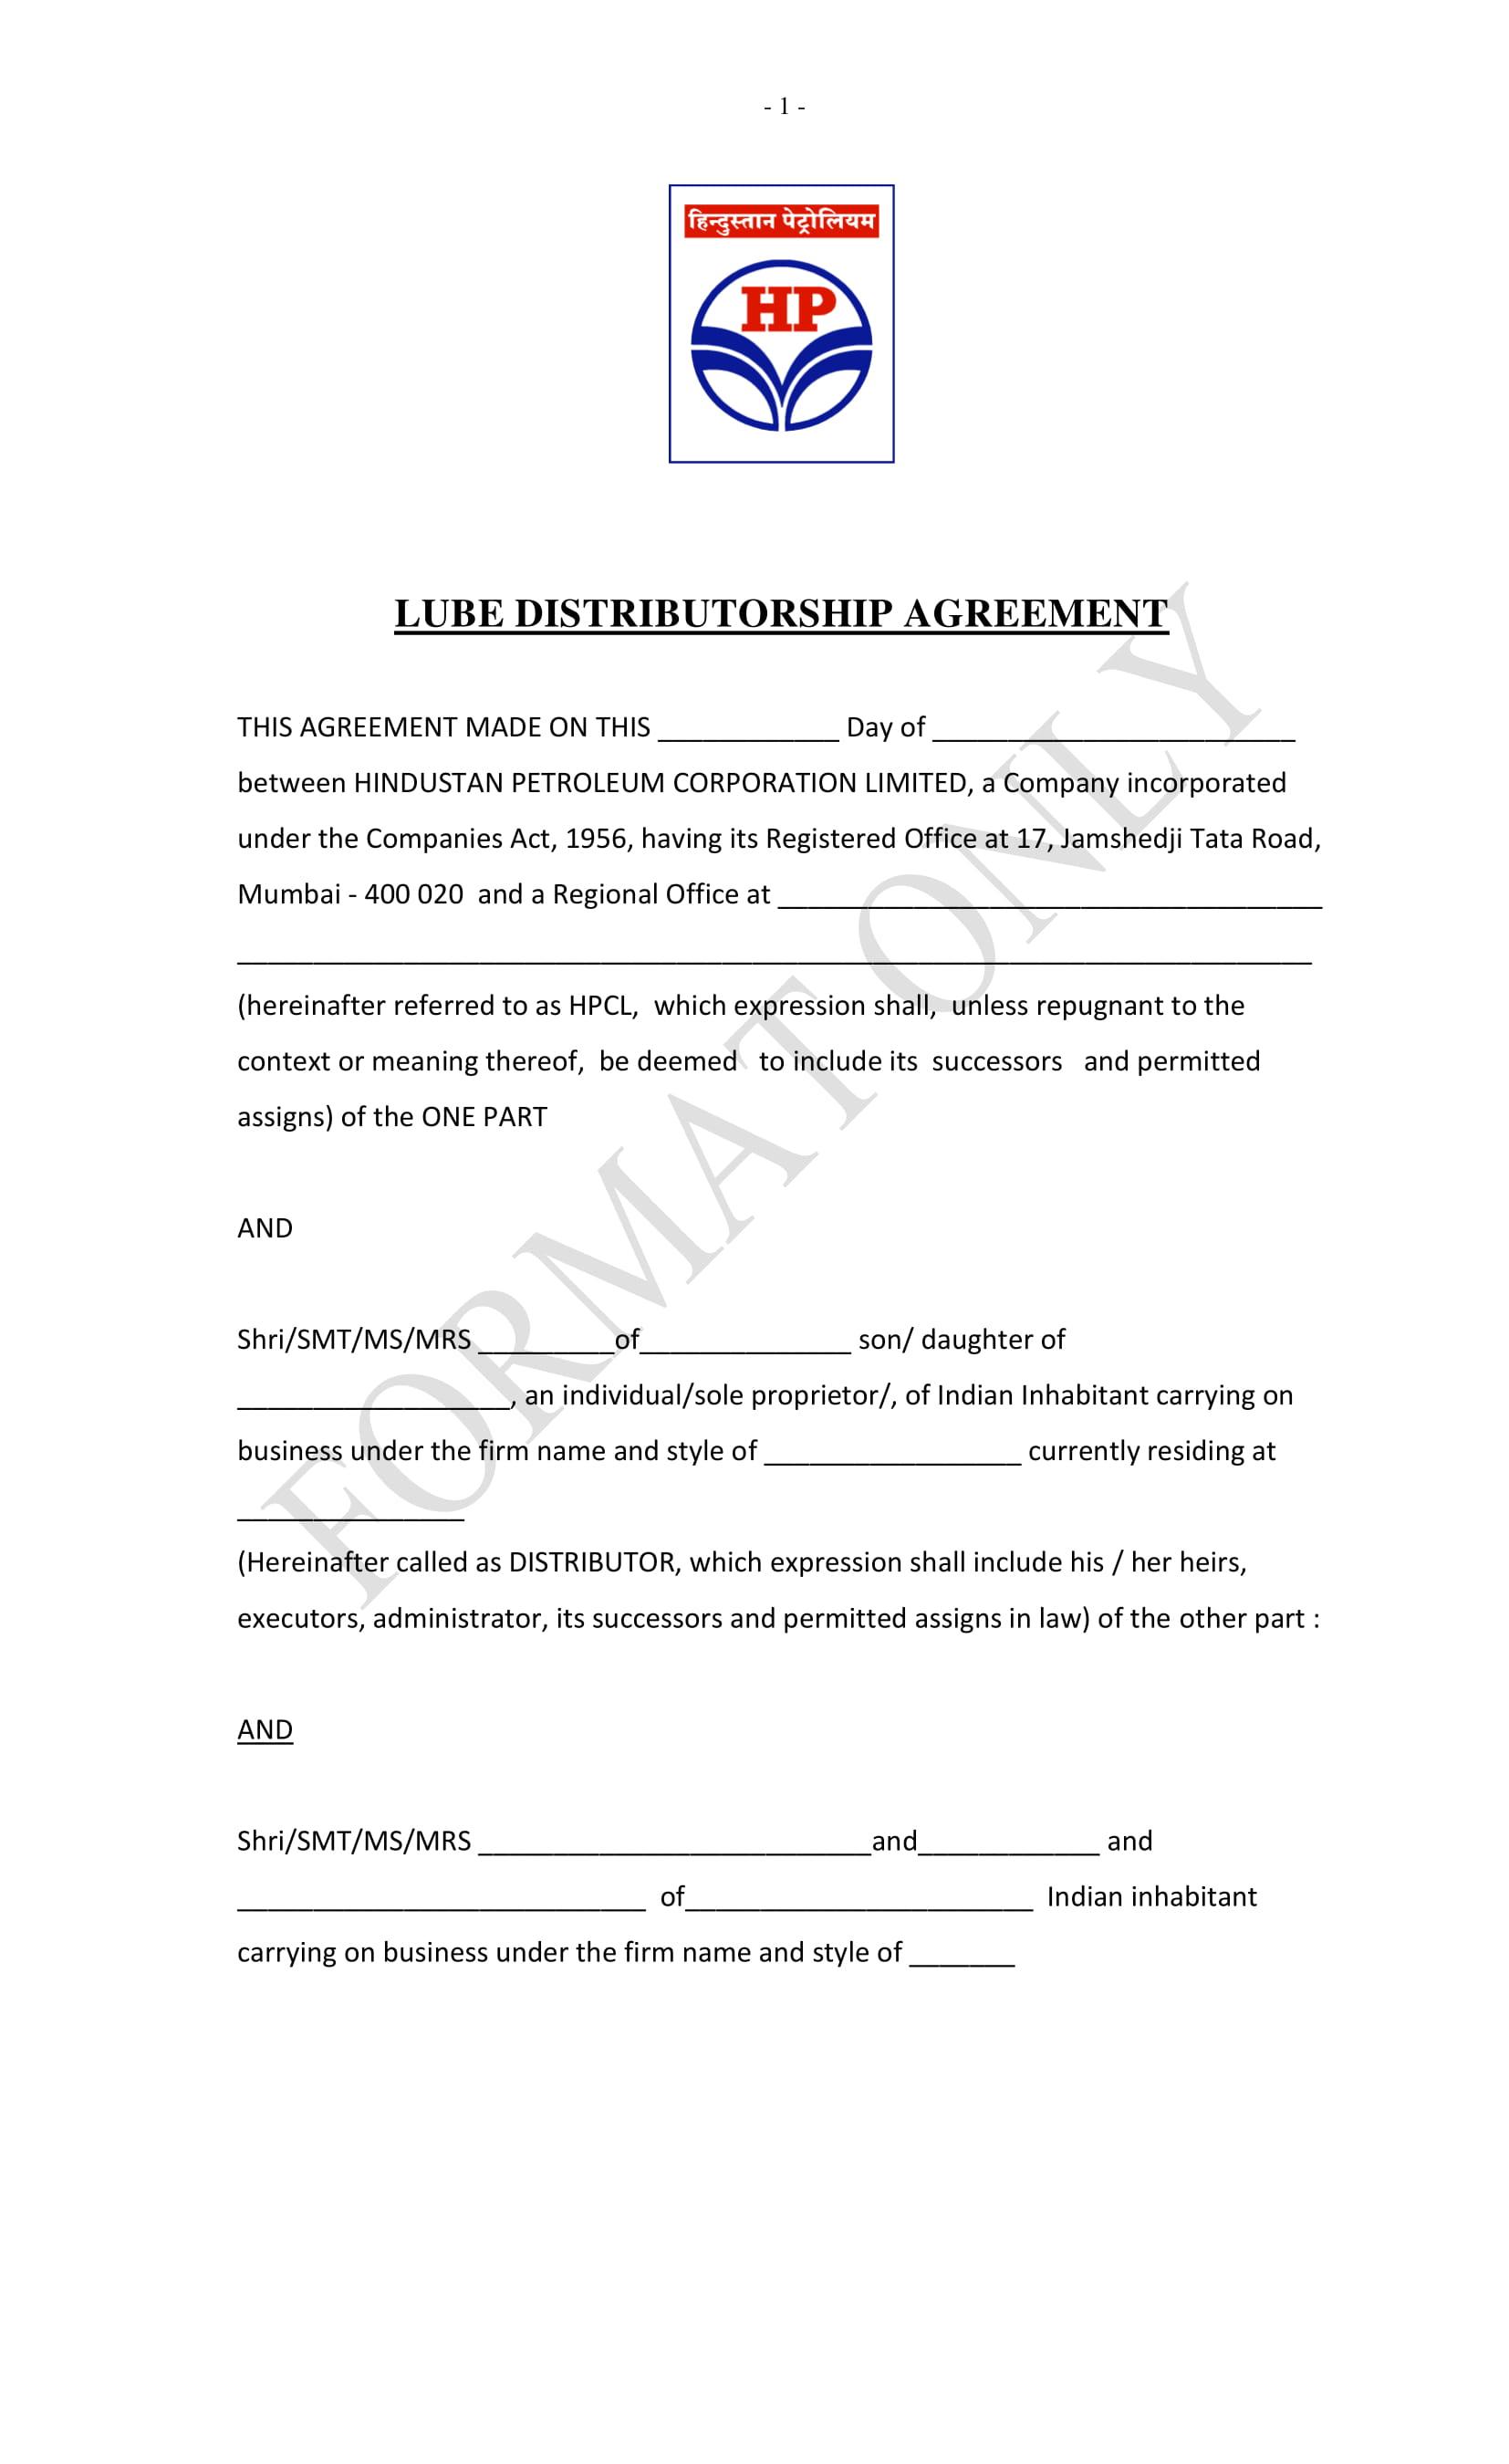 lube distributorship agreement contract form 01